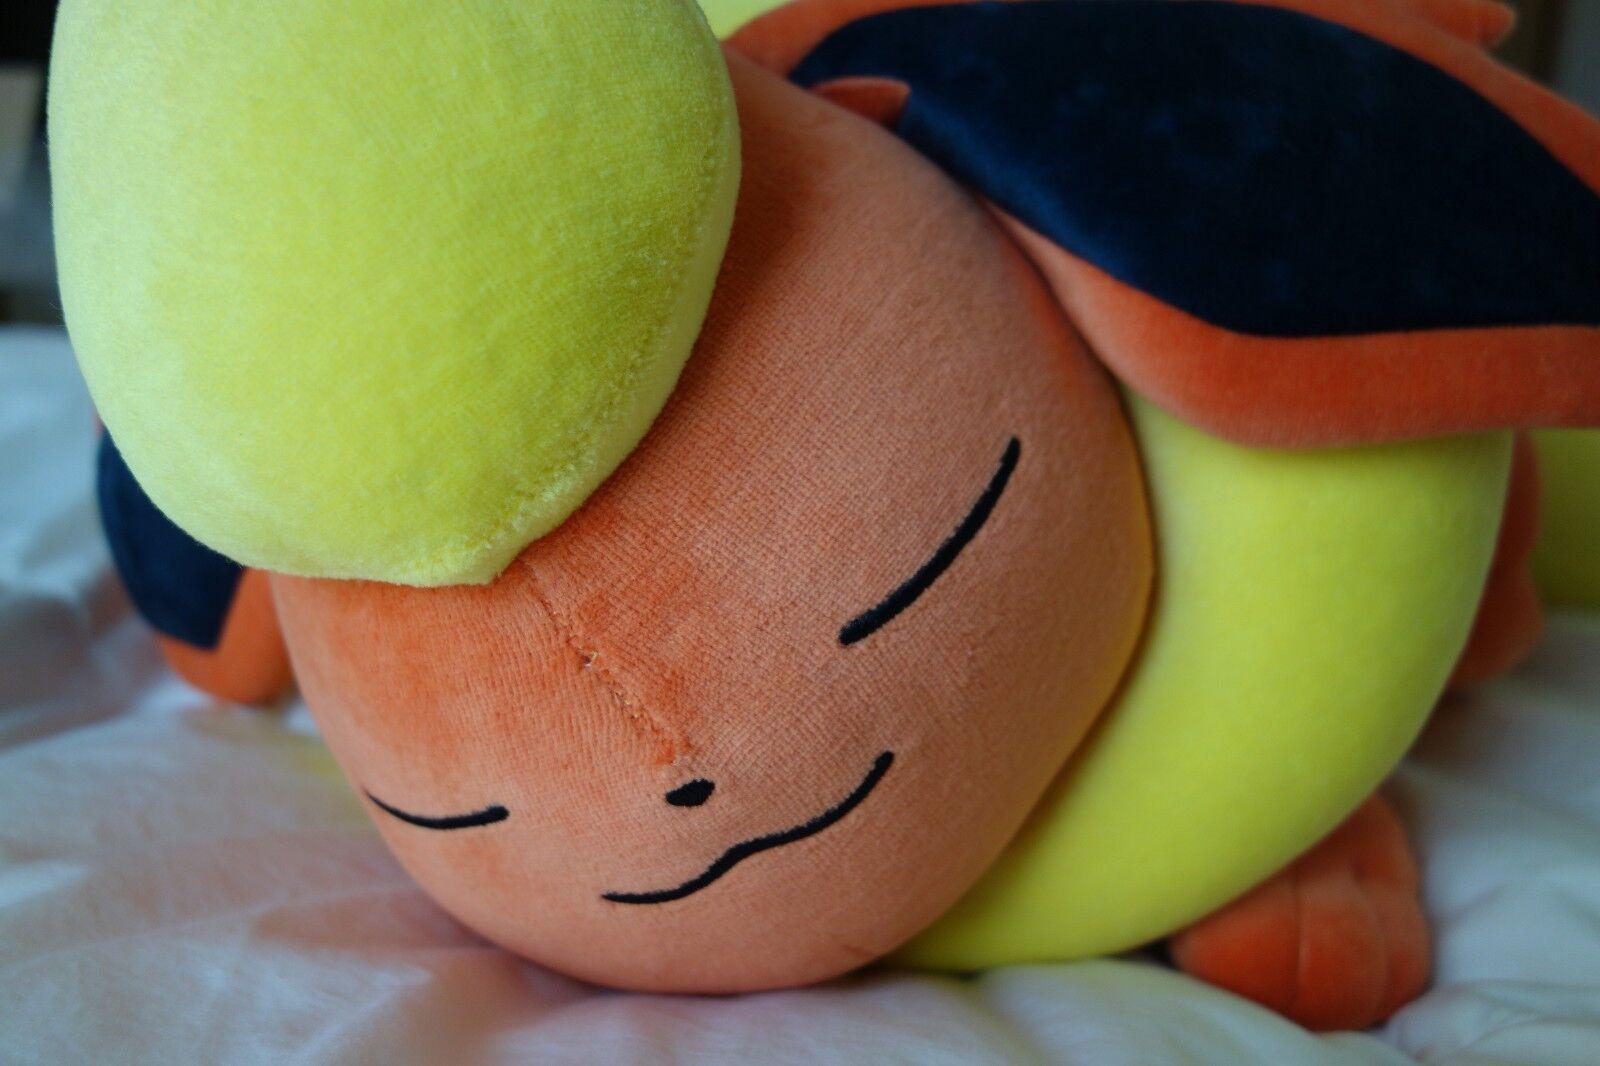 Flareon eeVee Pokemon Center Ltd Suyasuya Sleeping Flareon Plush   Pikachu Towel